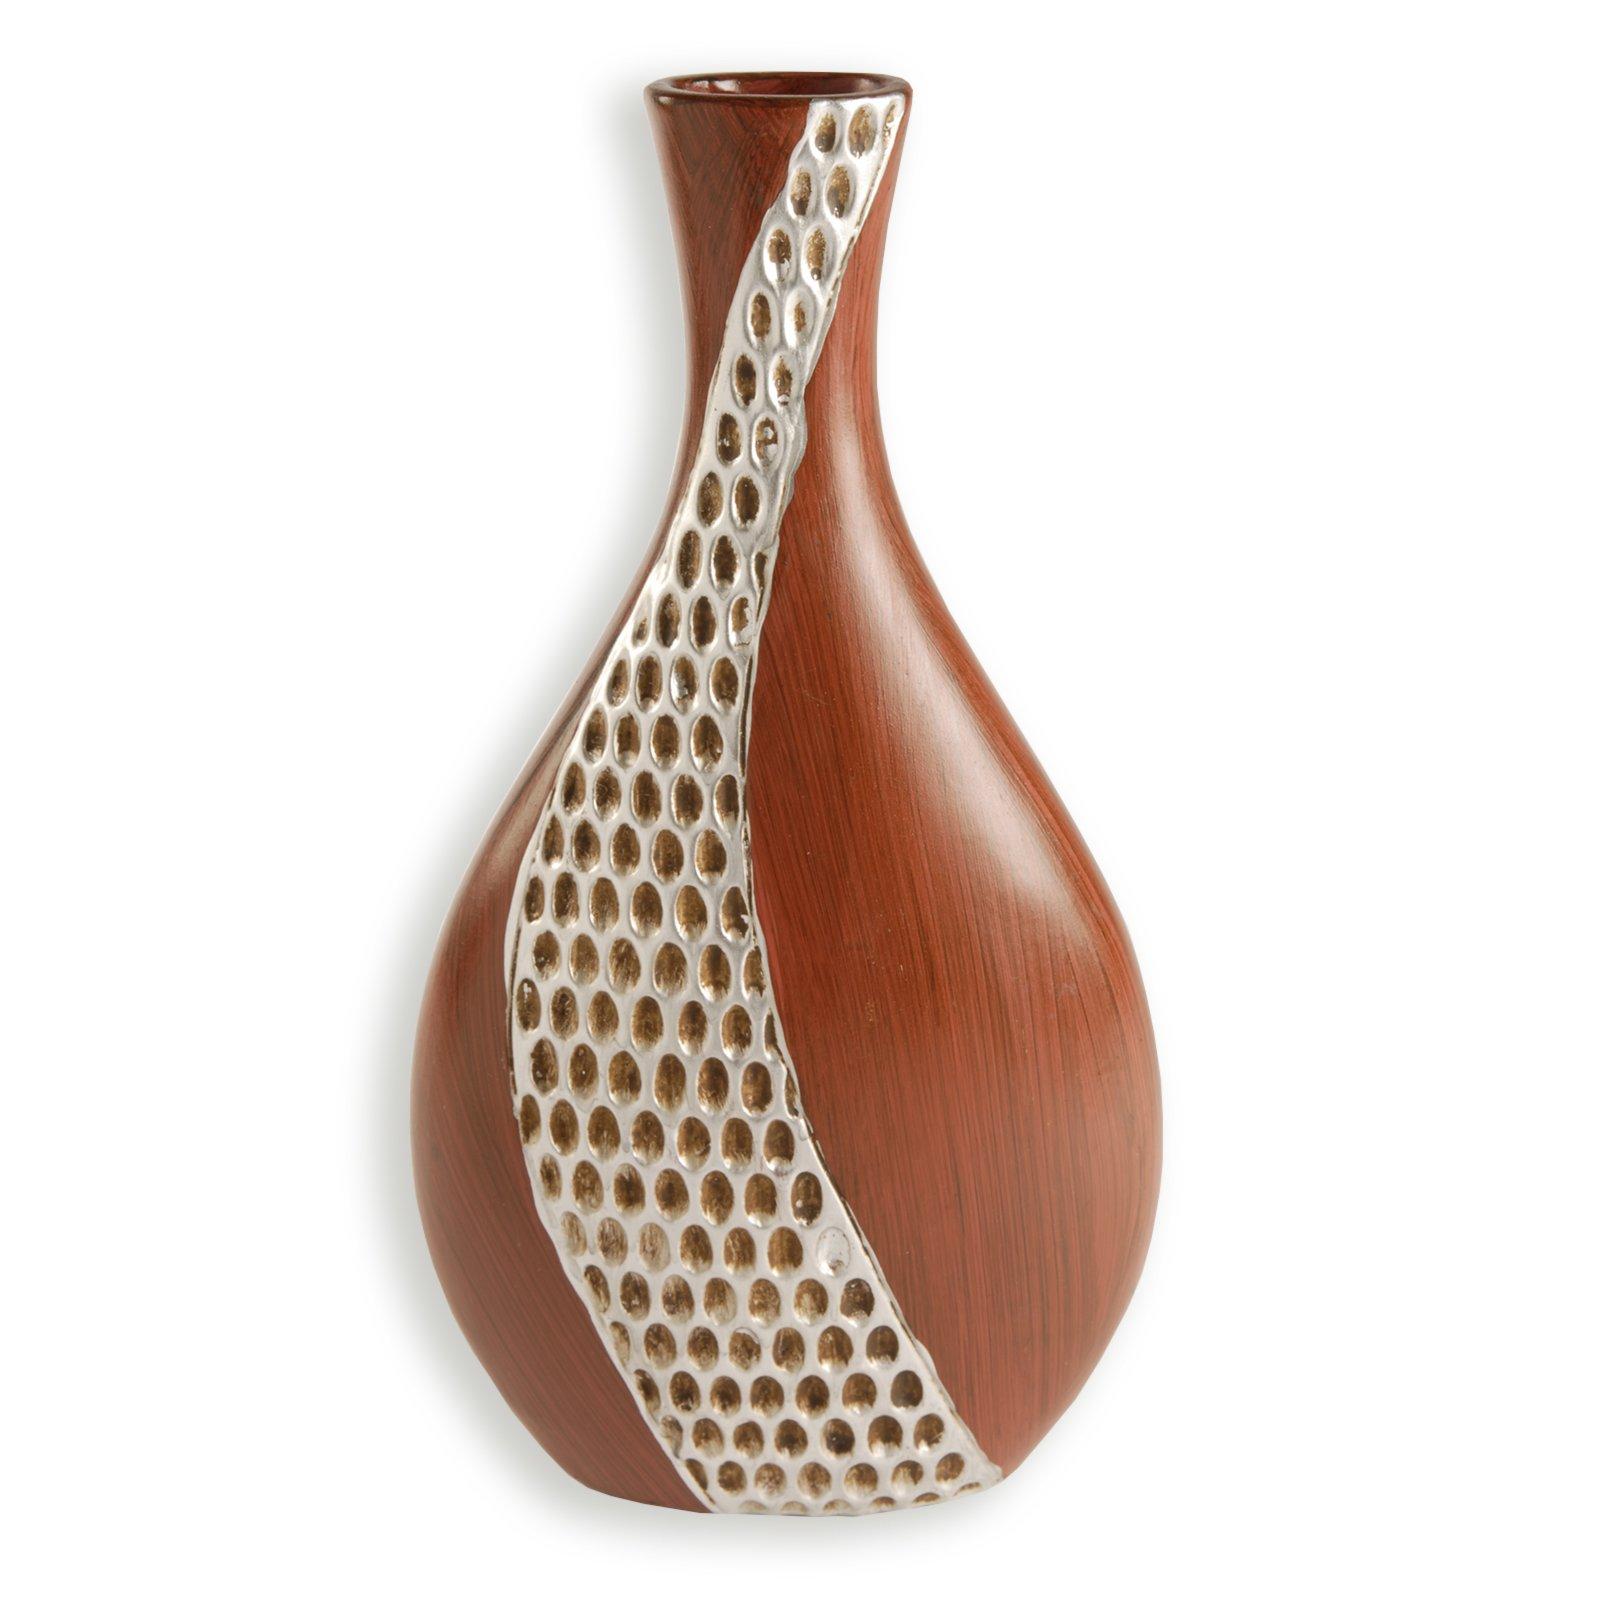 vase braun silber keramik 28 cm vasen deko. Black Bedroom Furniture Sets. Home Design Ideas